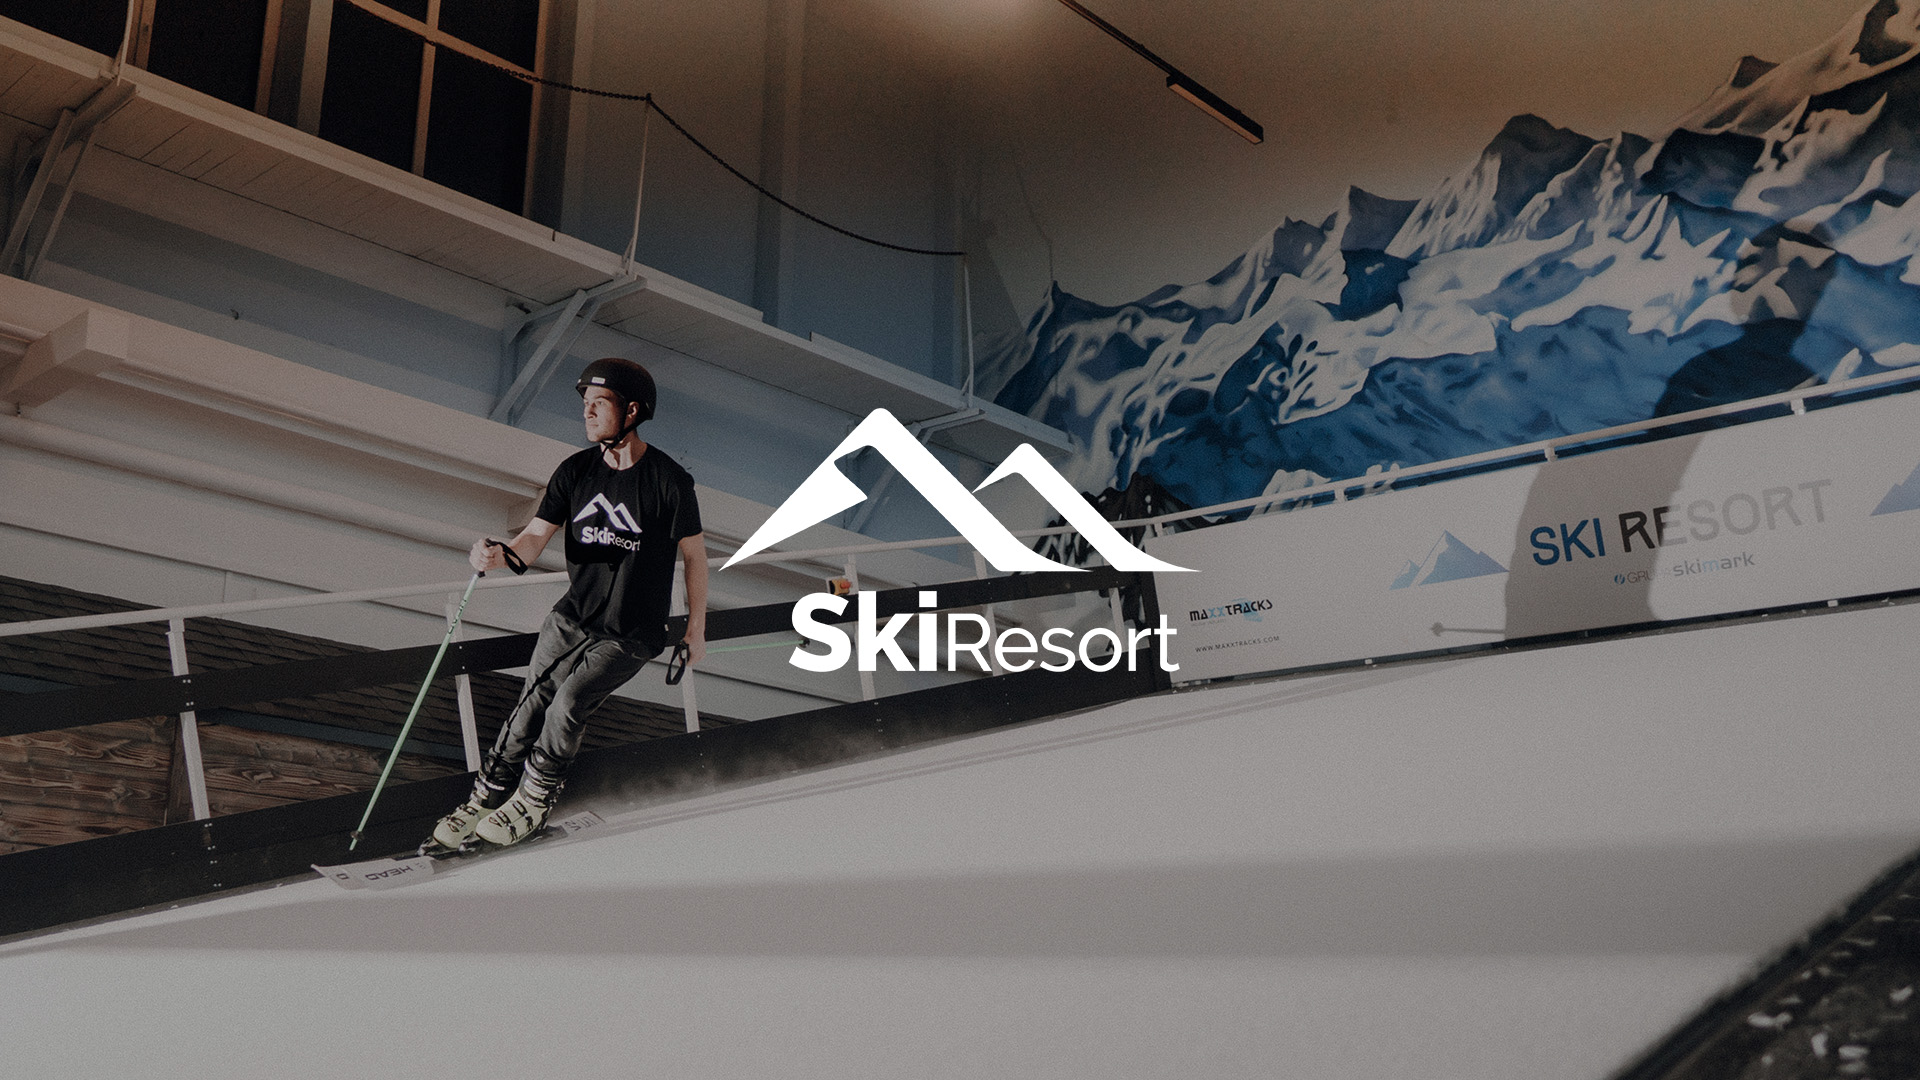 Ski Restort